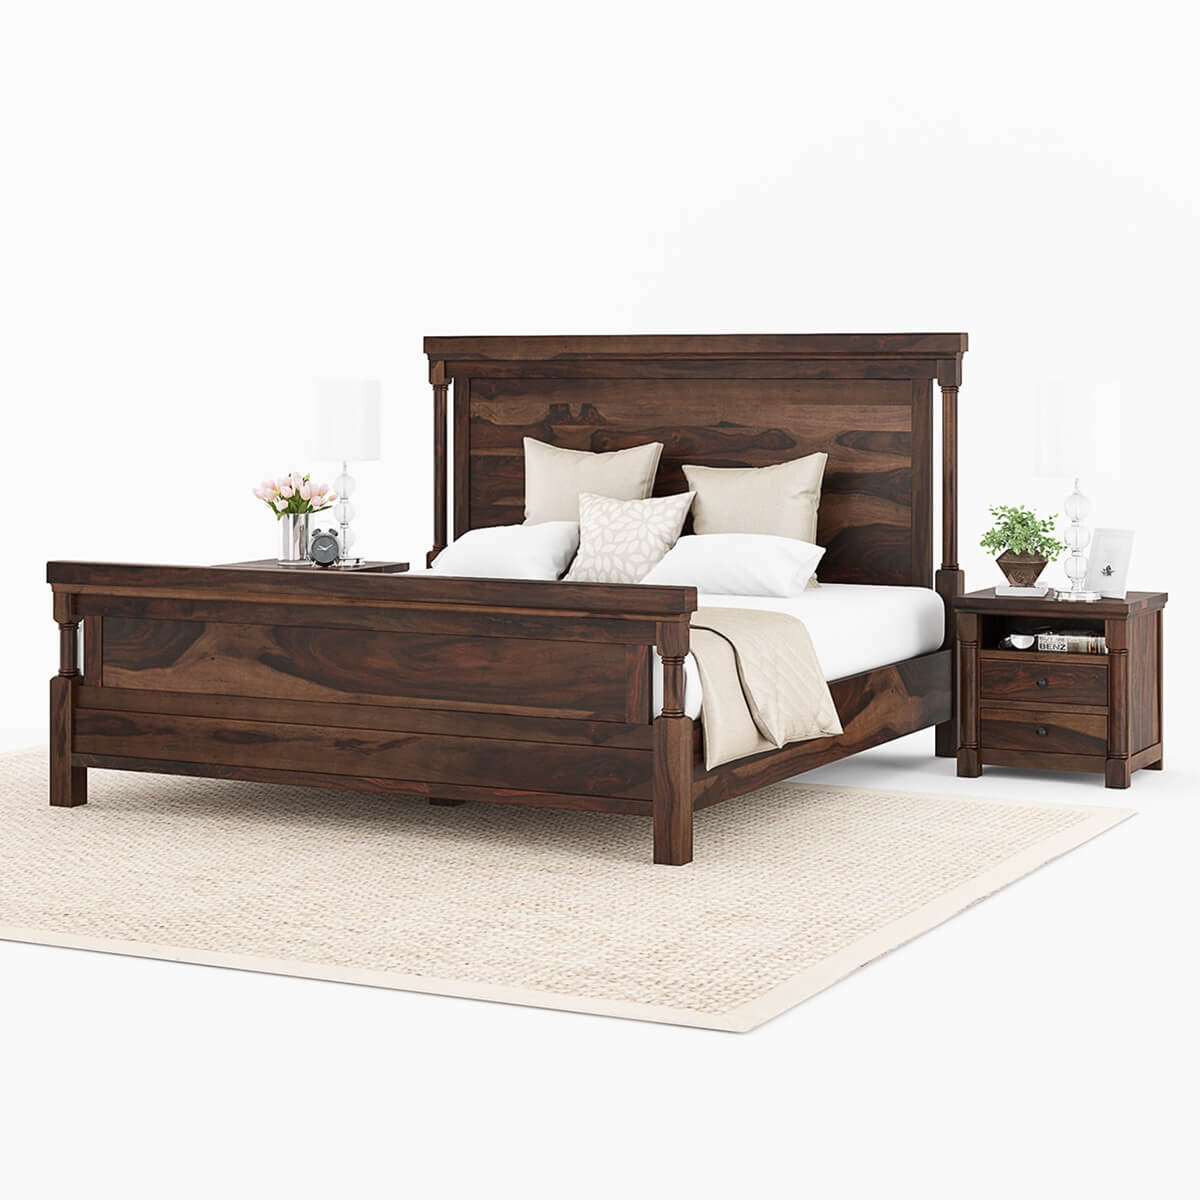 Transitional Bedroom Sets: Pioneer Transitional 7 Piece Bedroom Set